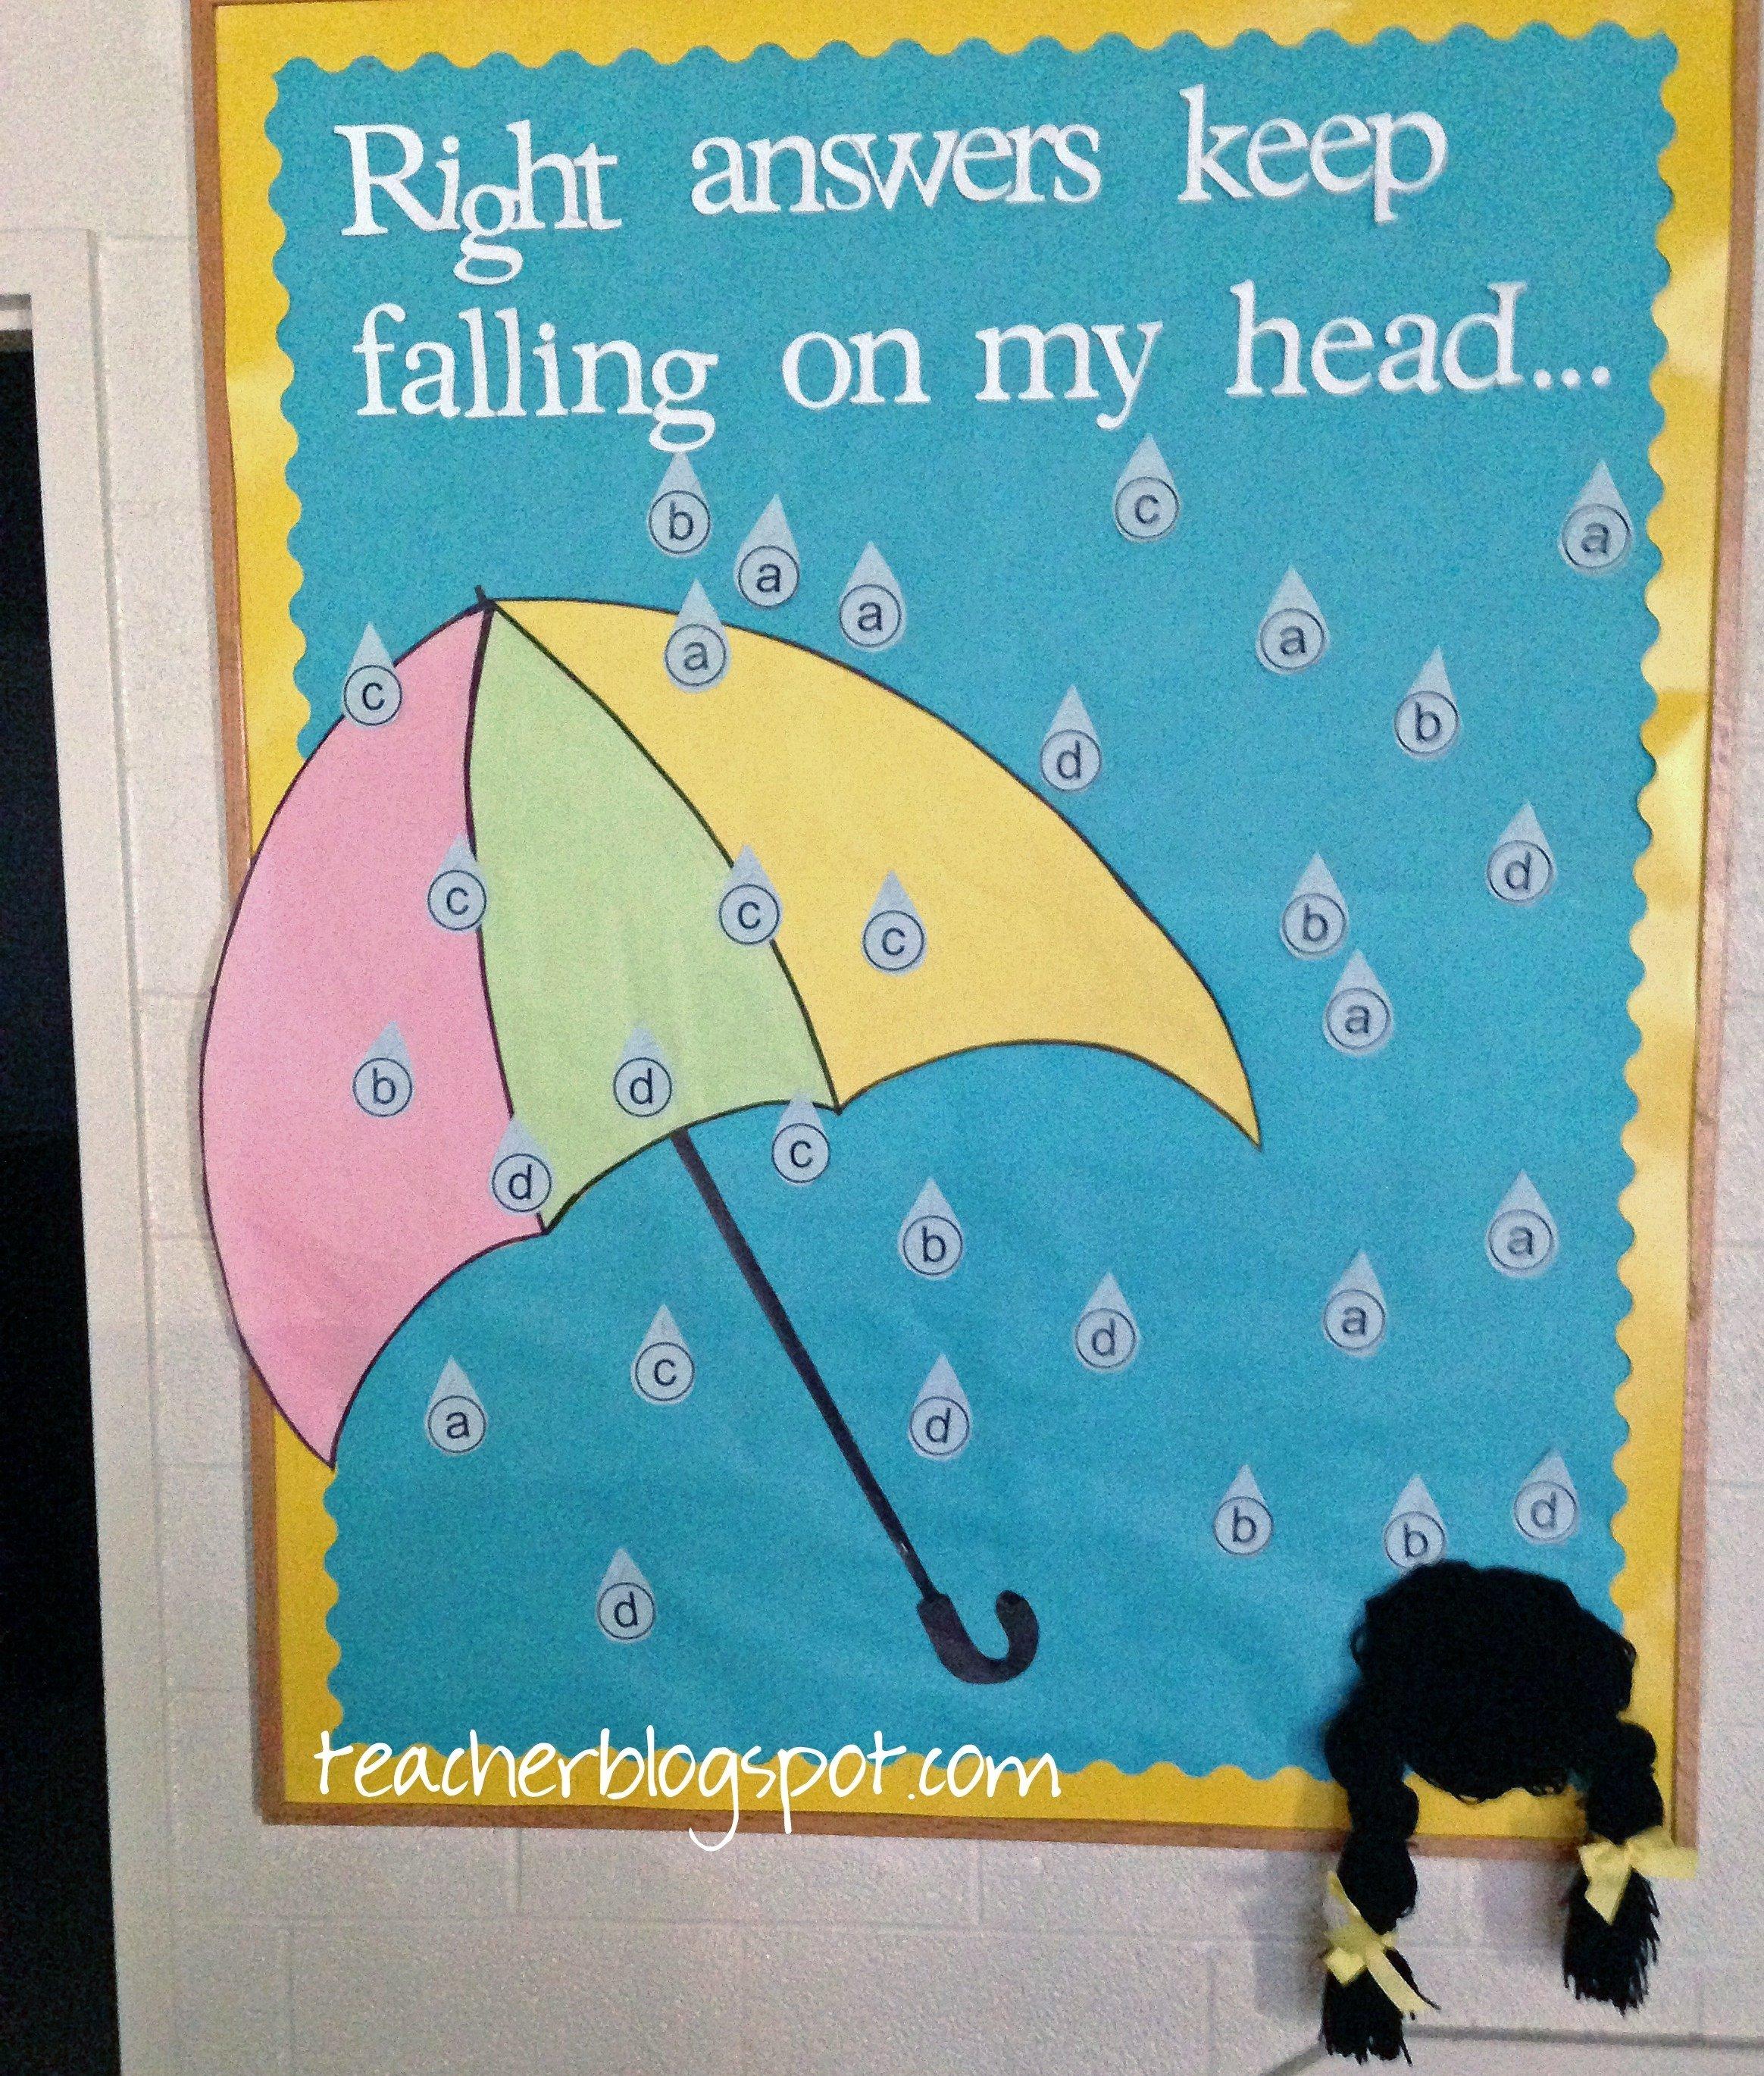 10 Attractive April Showers Bulletin Board Ideas do you need an april bulletin board idea teacher blog spot 2021